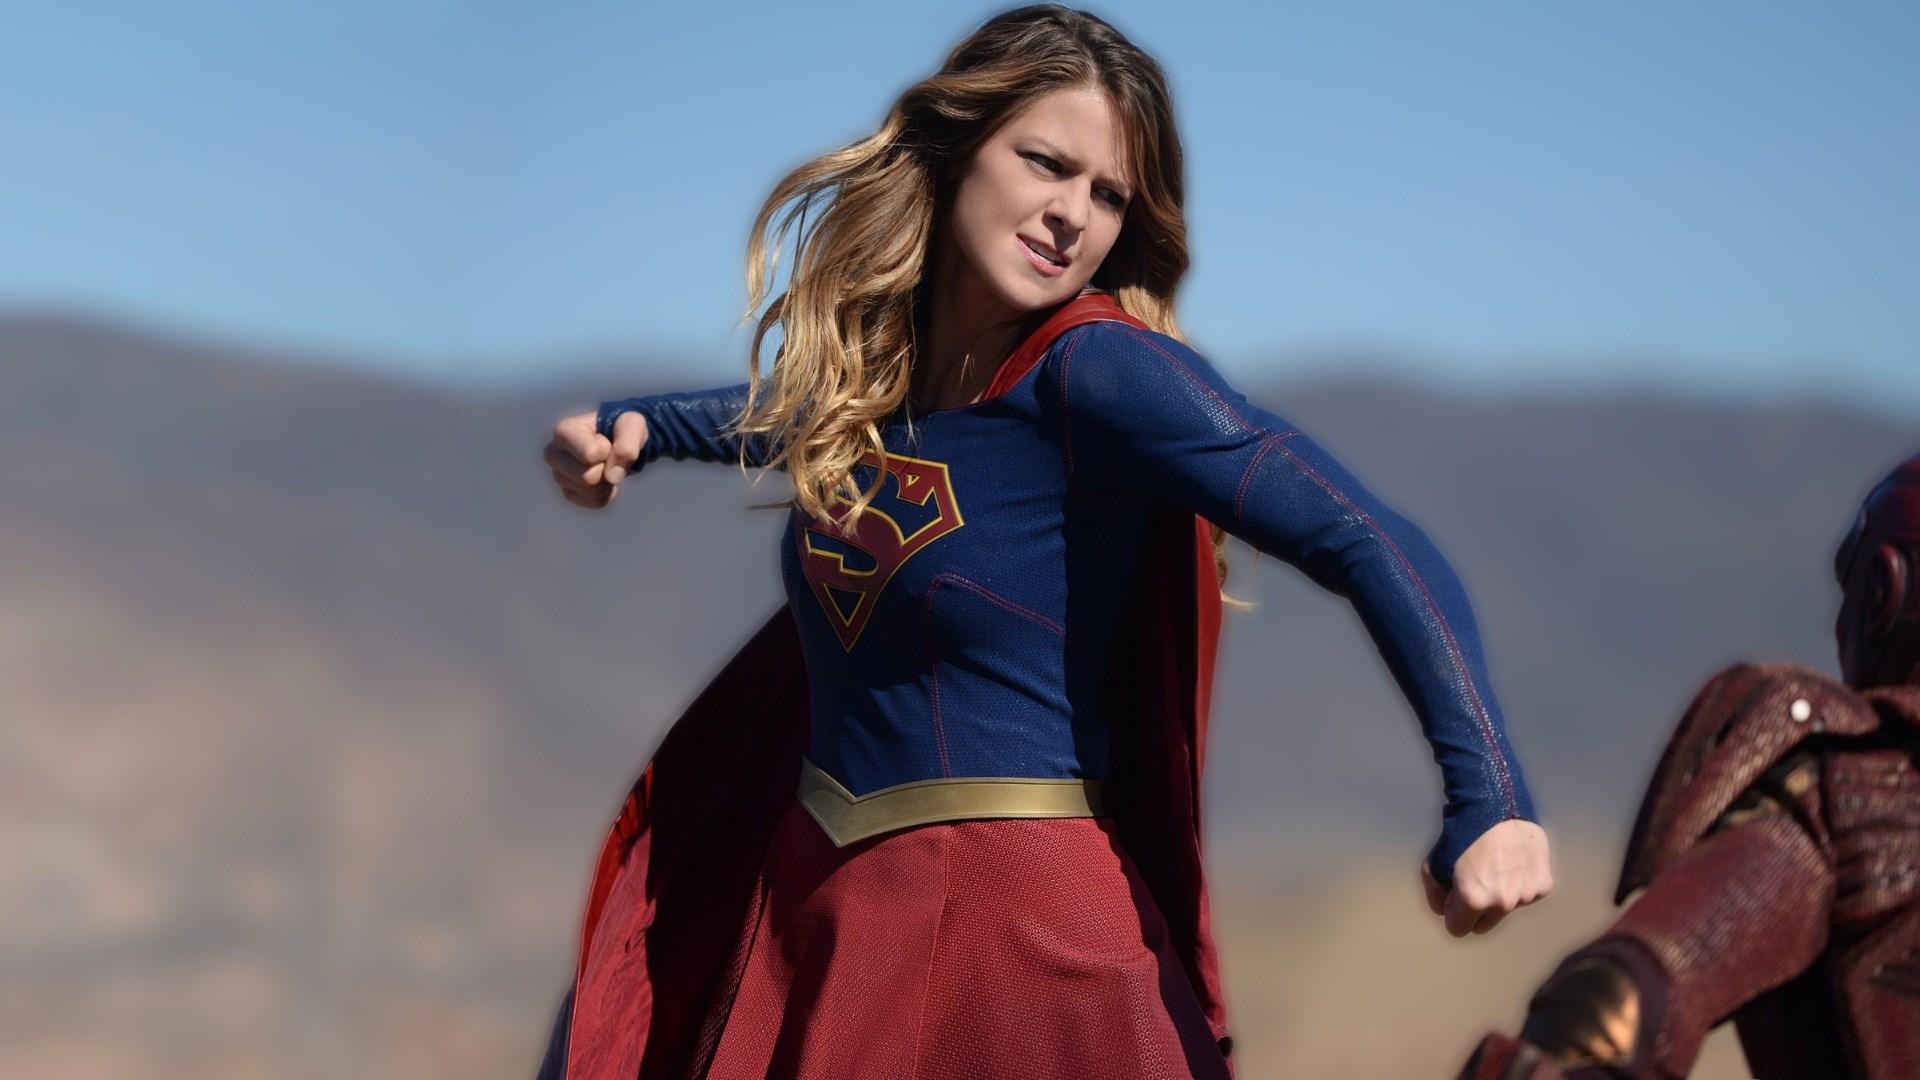 supergirl hd - photo #14